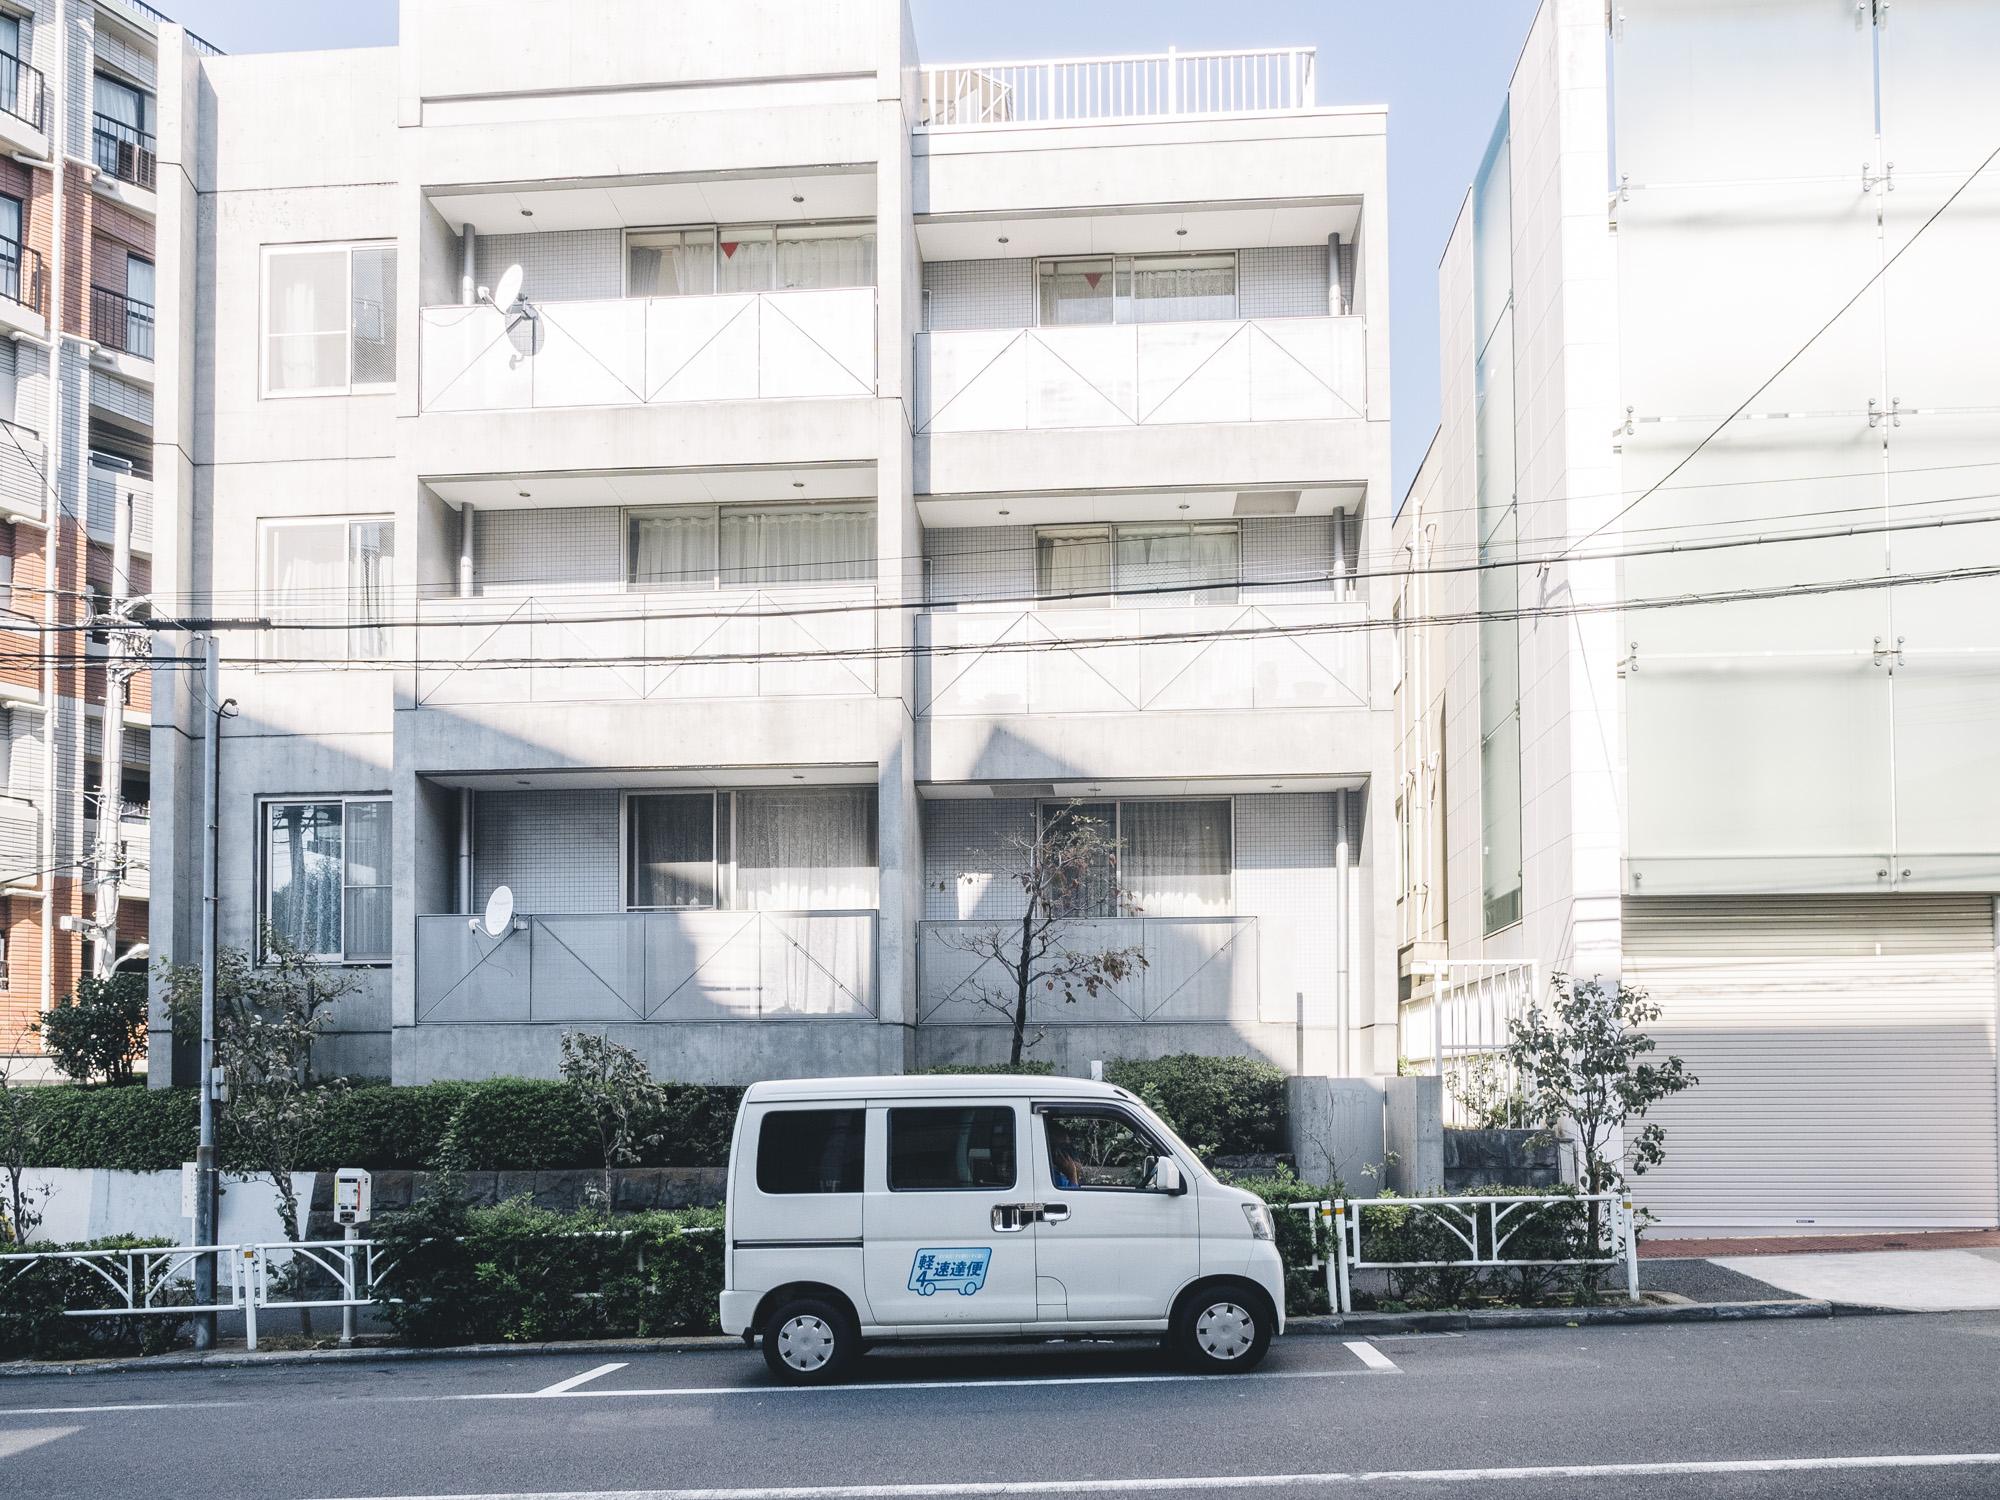 Japan2014_a170256.jpg